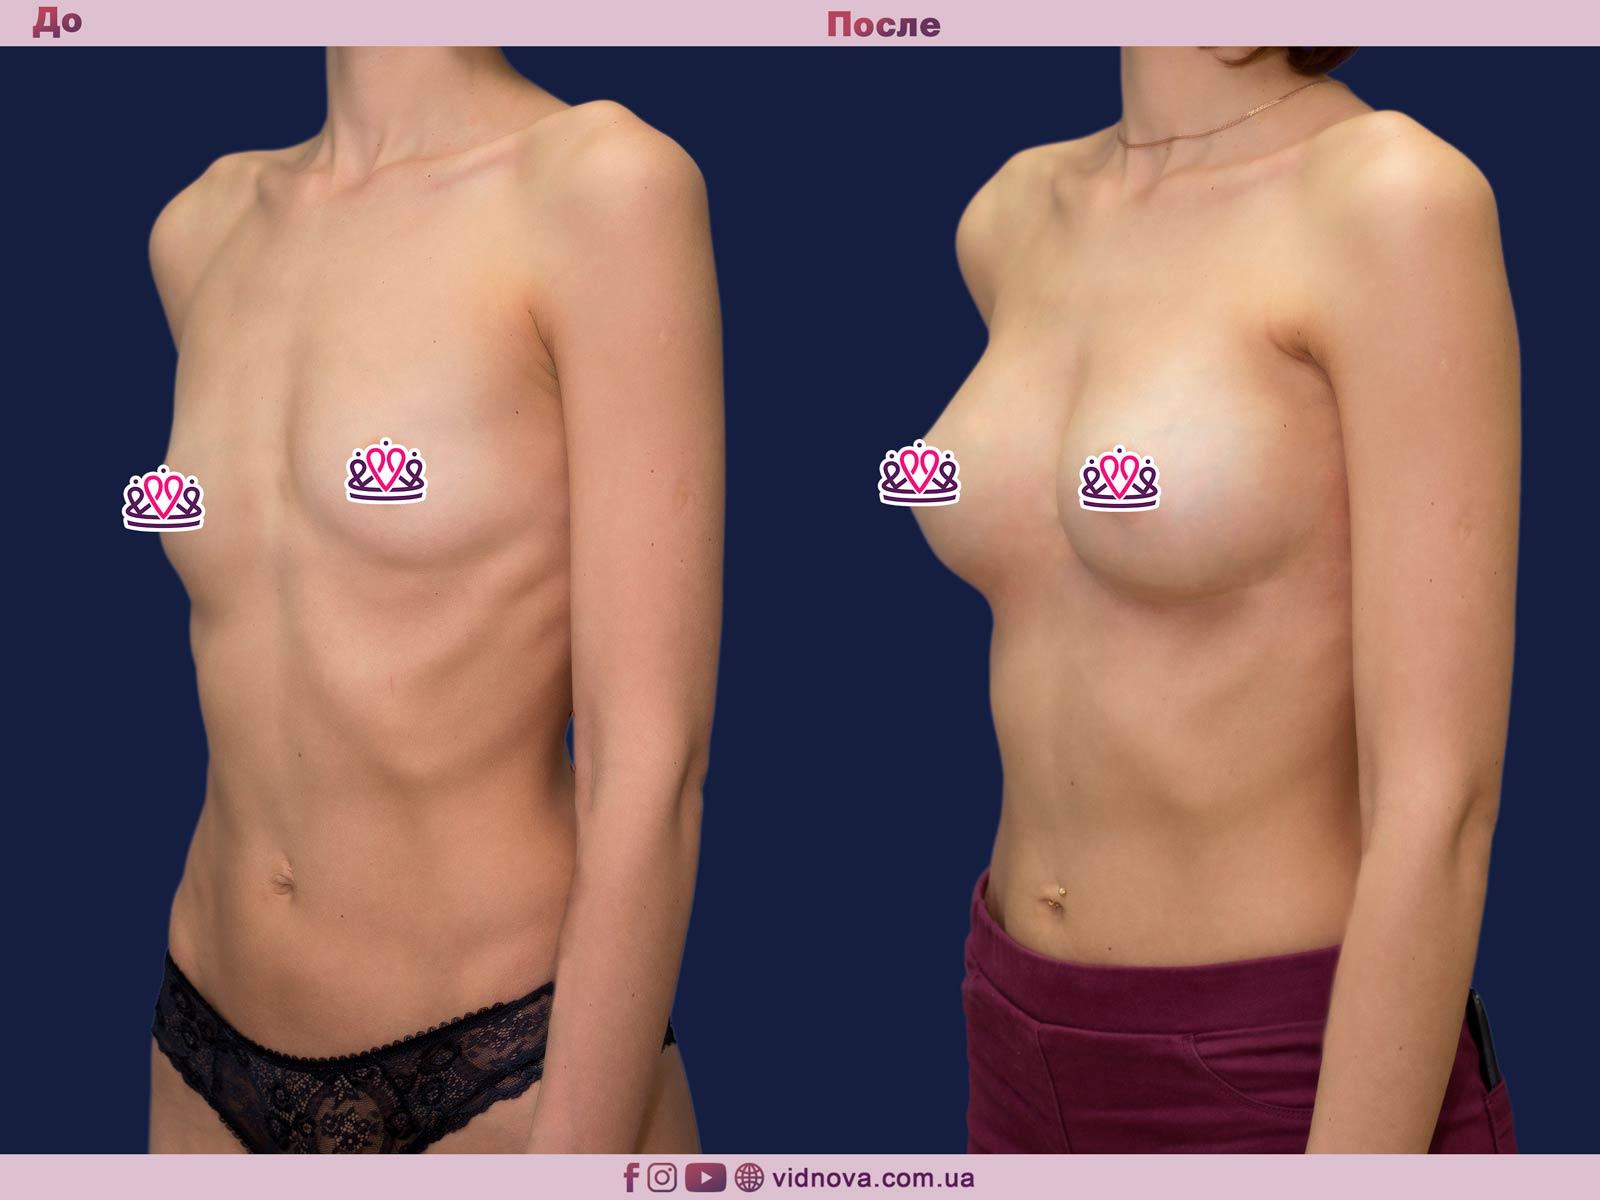 Увеличение груди: Фото ДО и ПОСЛЕ - Пример №76-2 - Клиника Vidnova